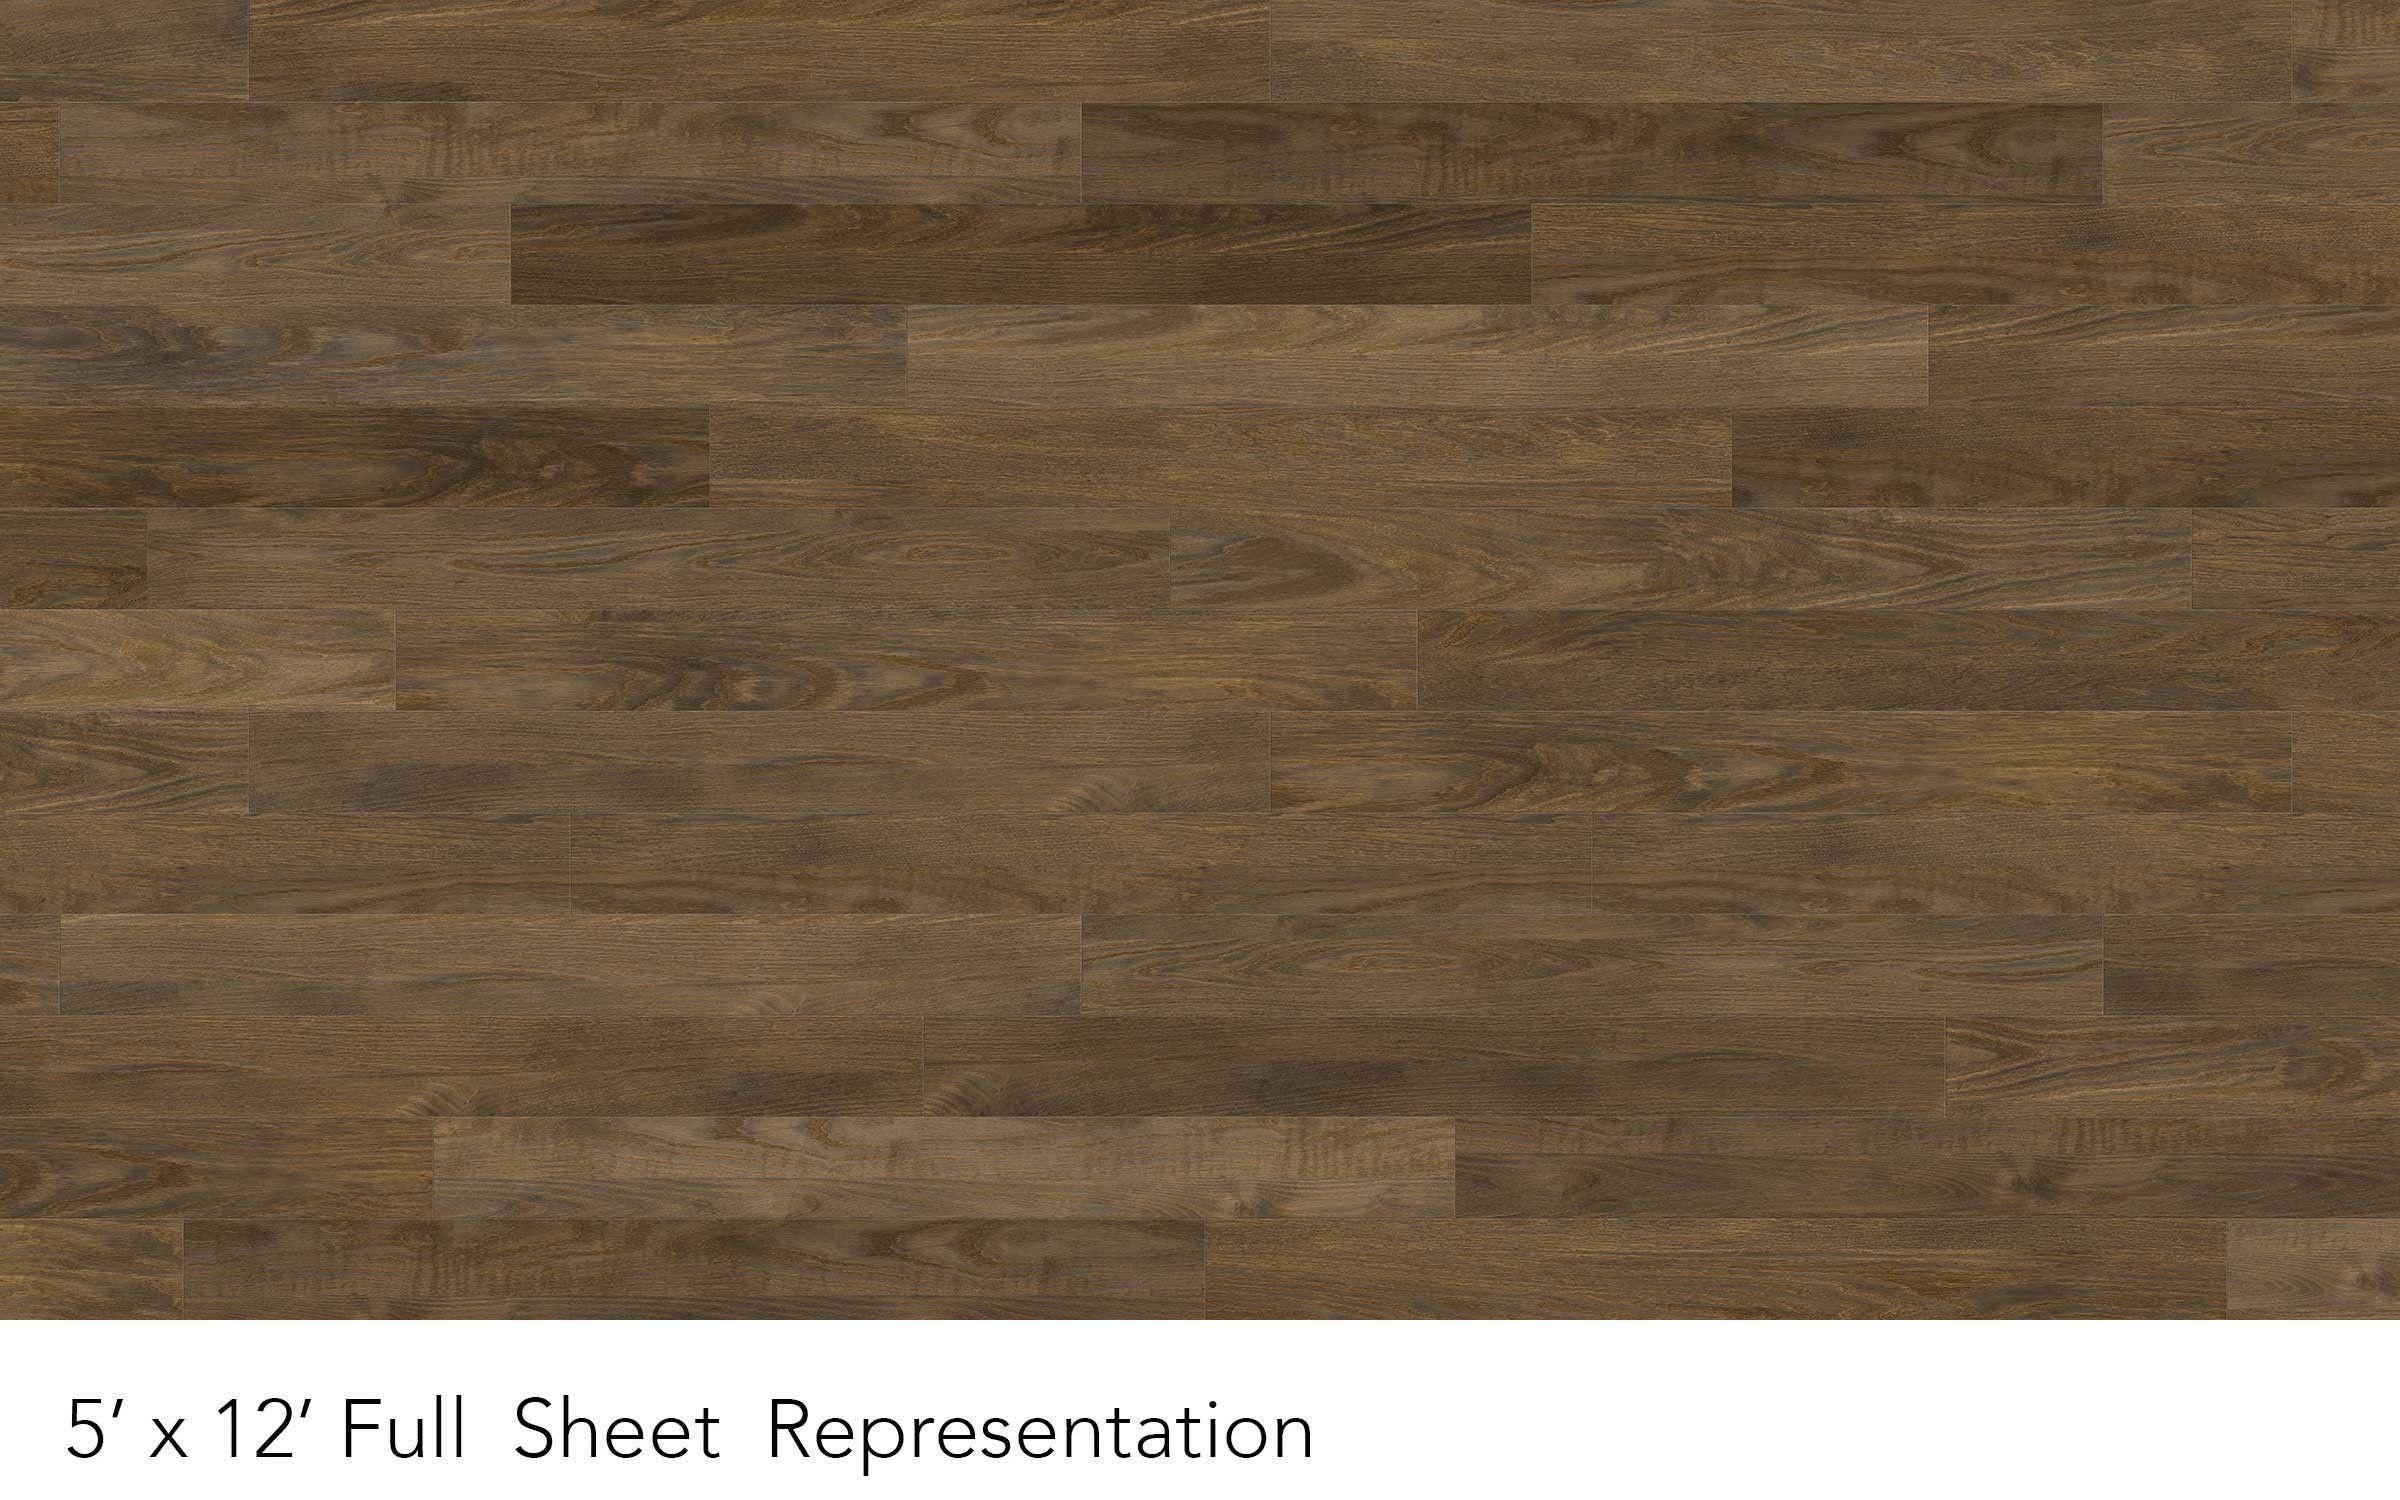 High Pressure Laminate Wood Flooring  Laminate Flooring Ideas